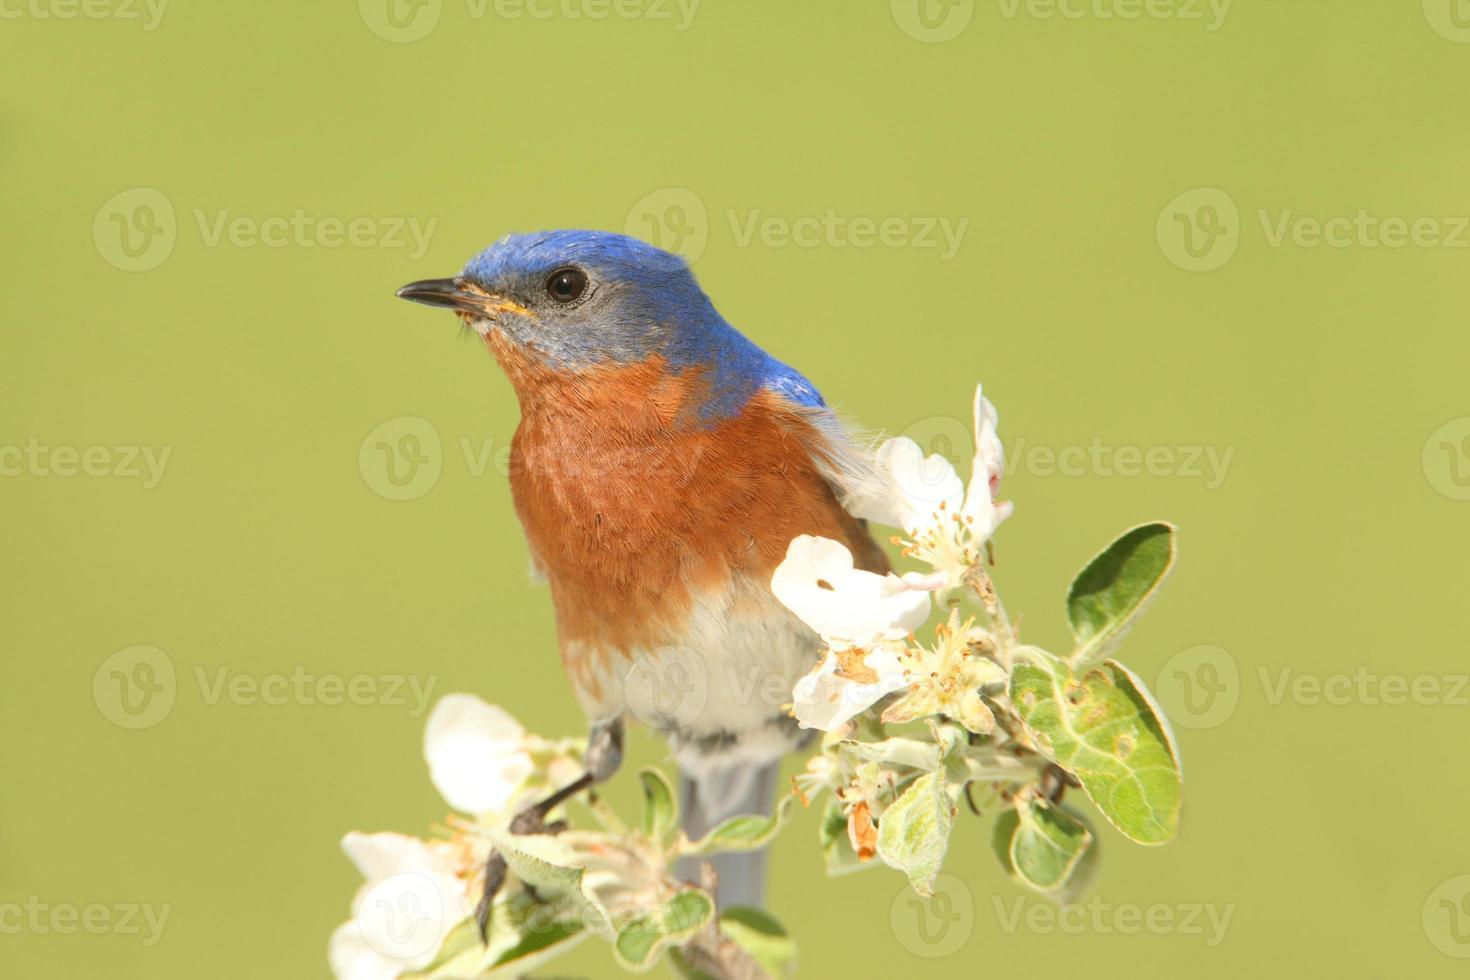 oiseau bleu mâle (Sialia sialis) photo